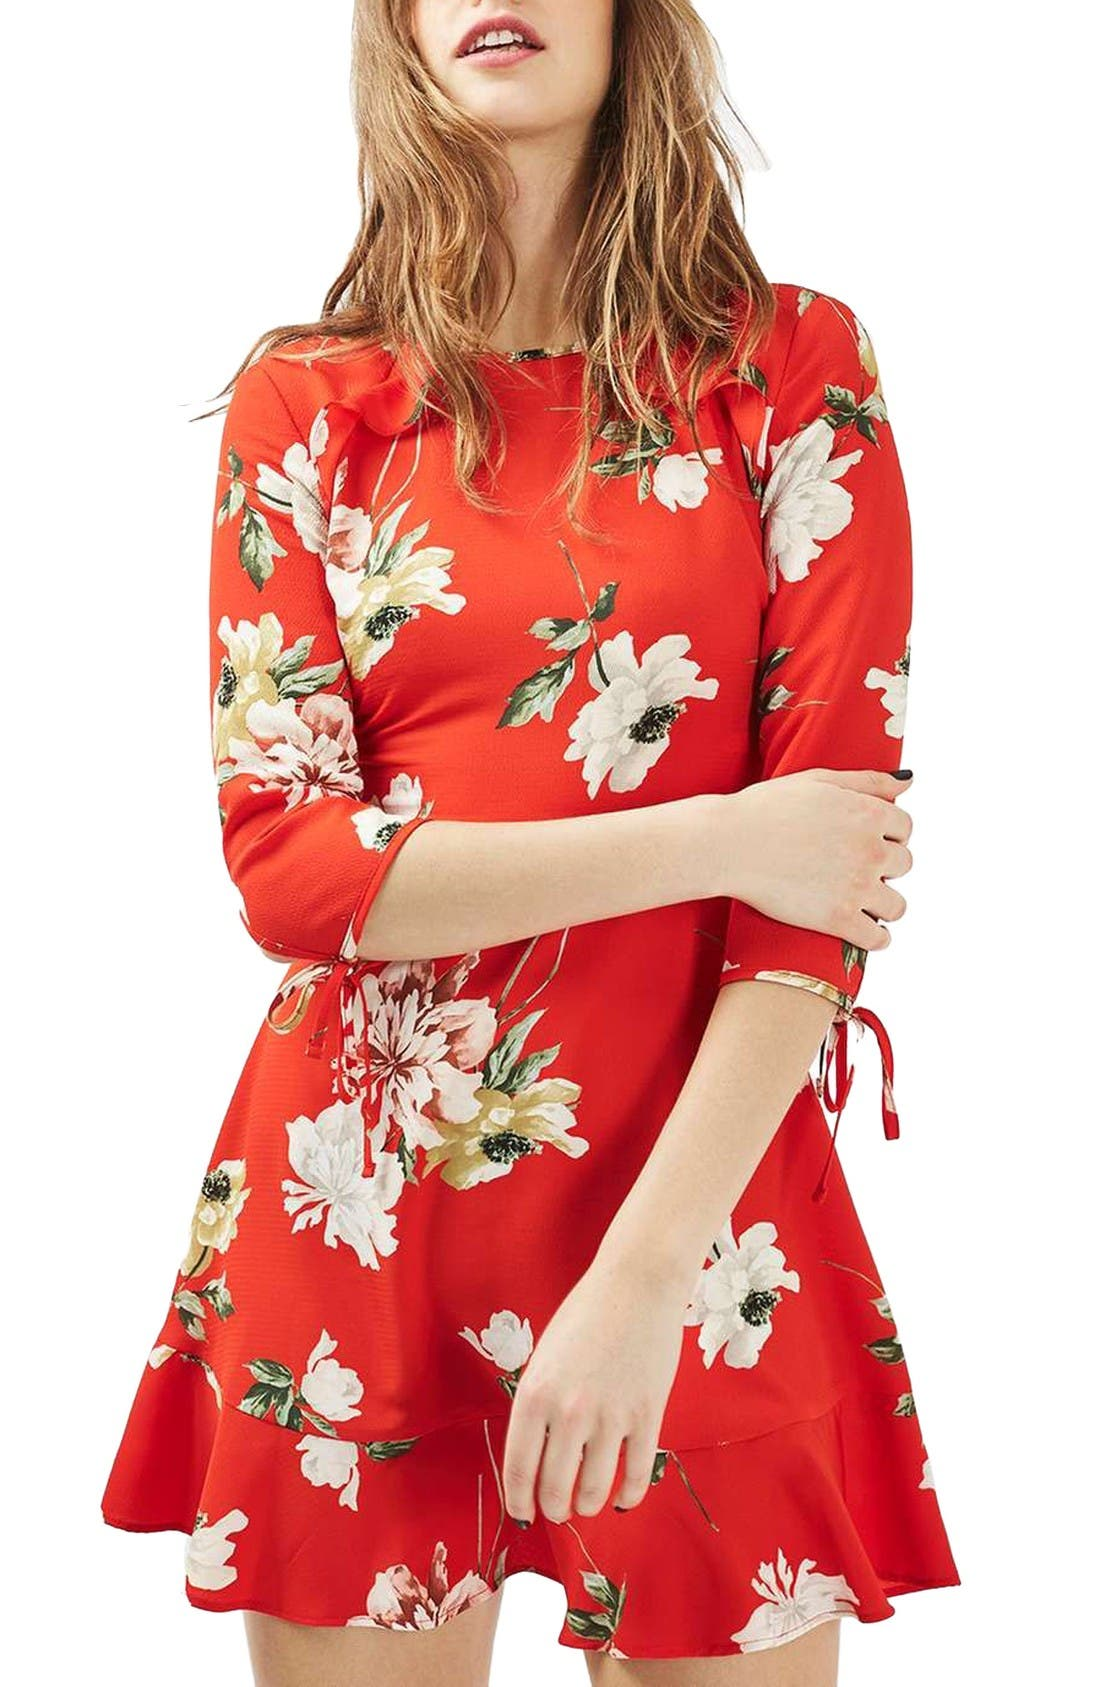 Ruffle Floral Tea Dress,                         Main,                         color, Red Multi